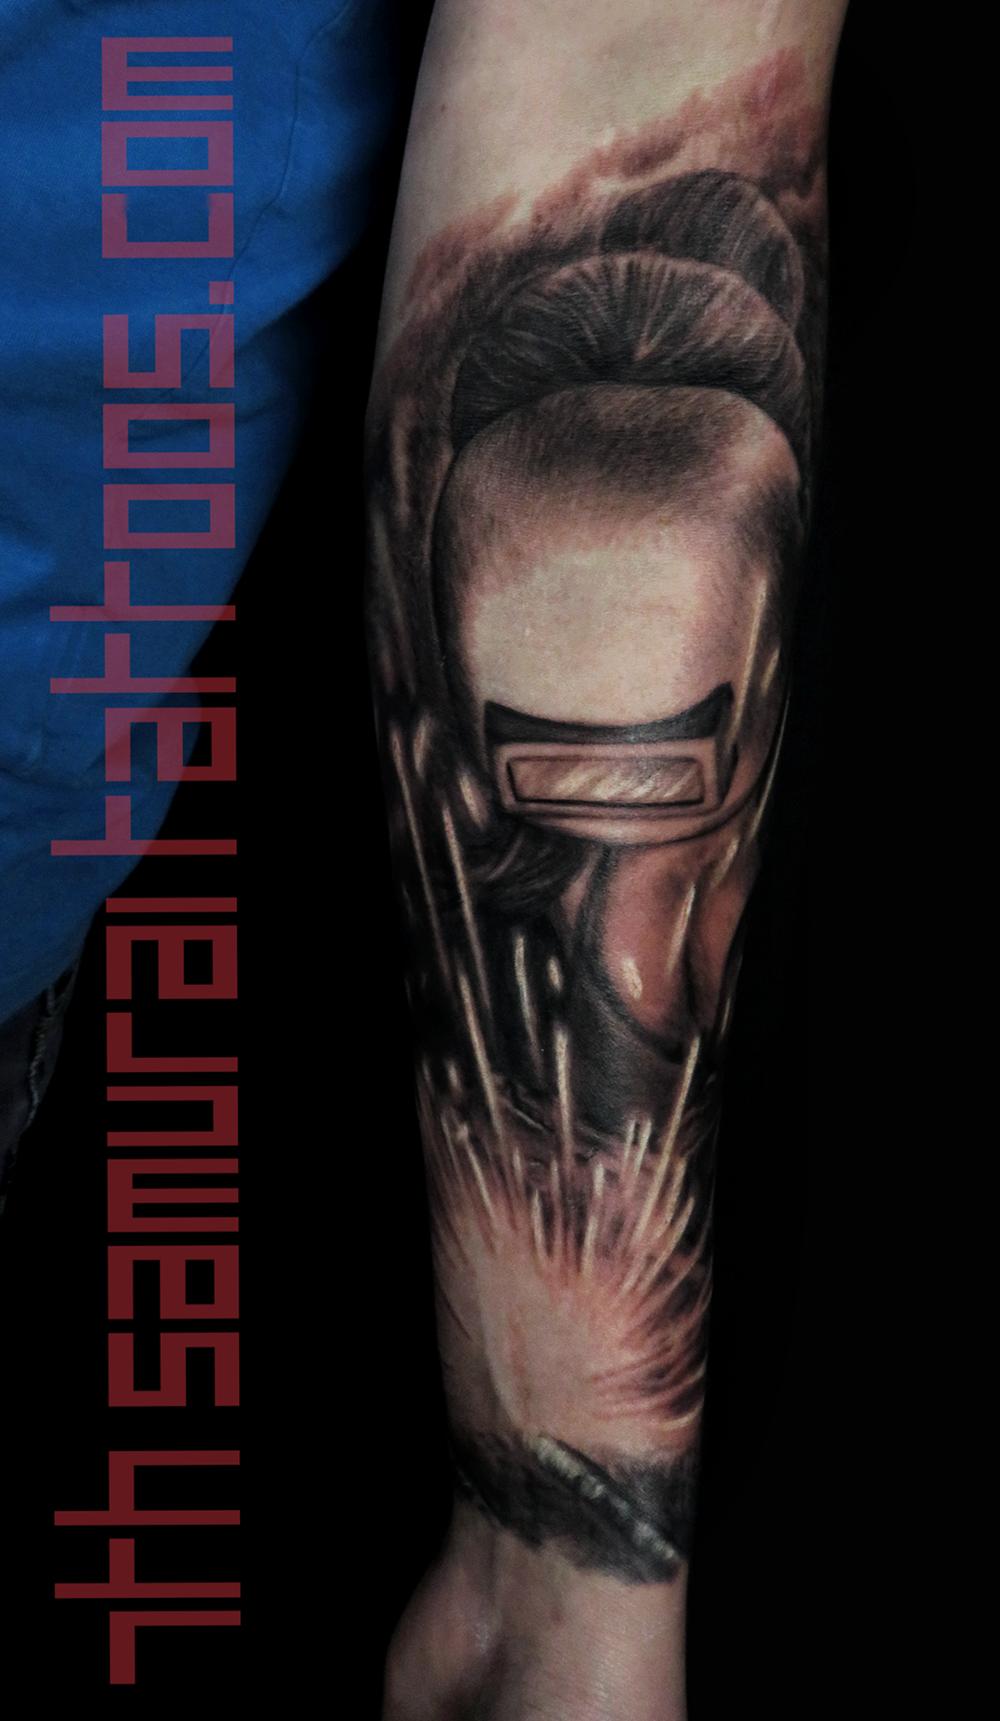 welder welding pipe fitter pin up cleavage woman men's forearm tattoo kai 7th samurai